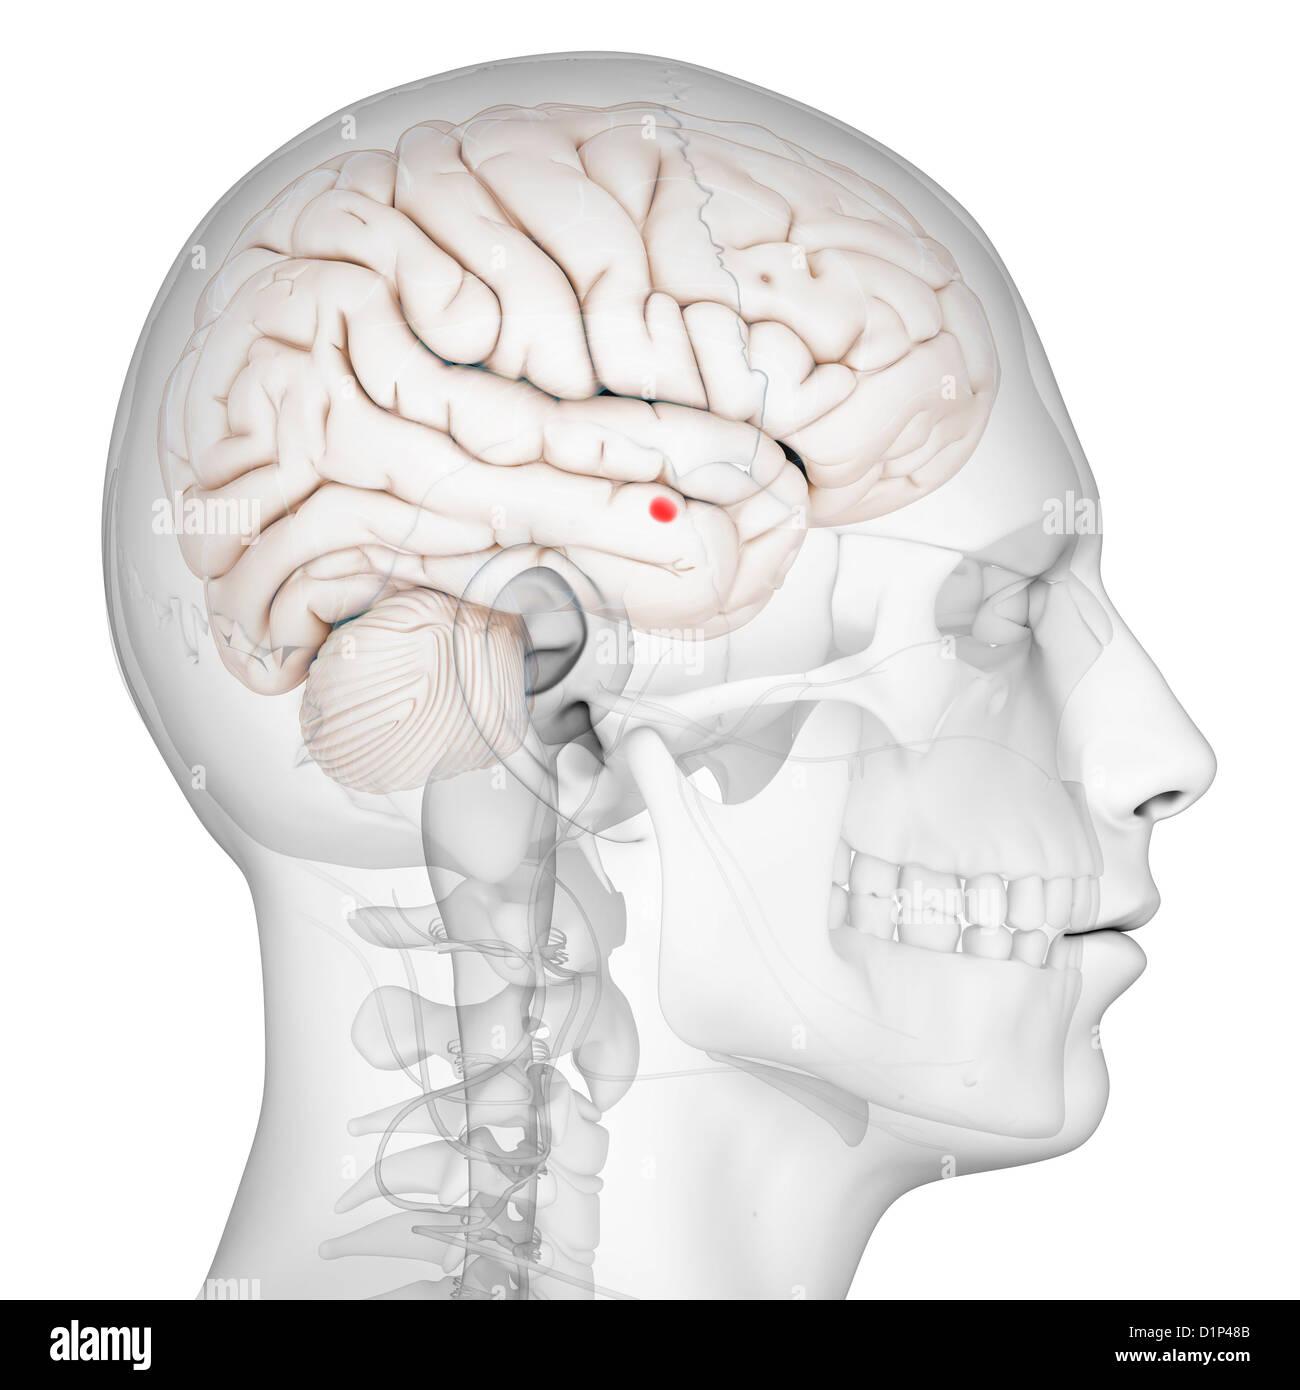 Limbic System Brain Stock Photos Limbic System Brain Stock Images